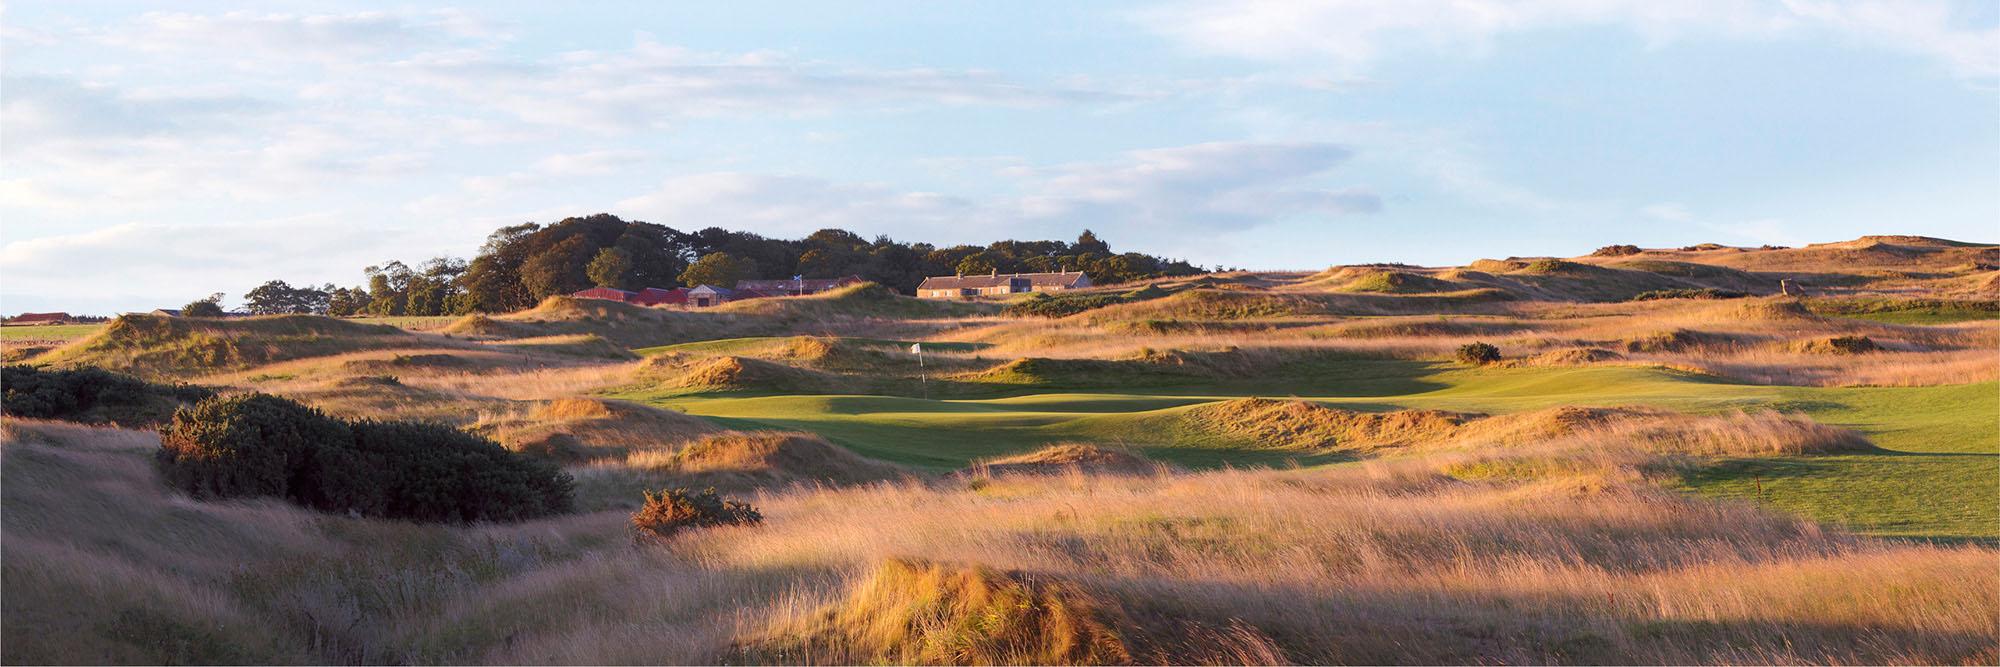 Golf Course Image - St Andrews Castle No. 10